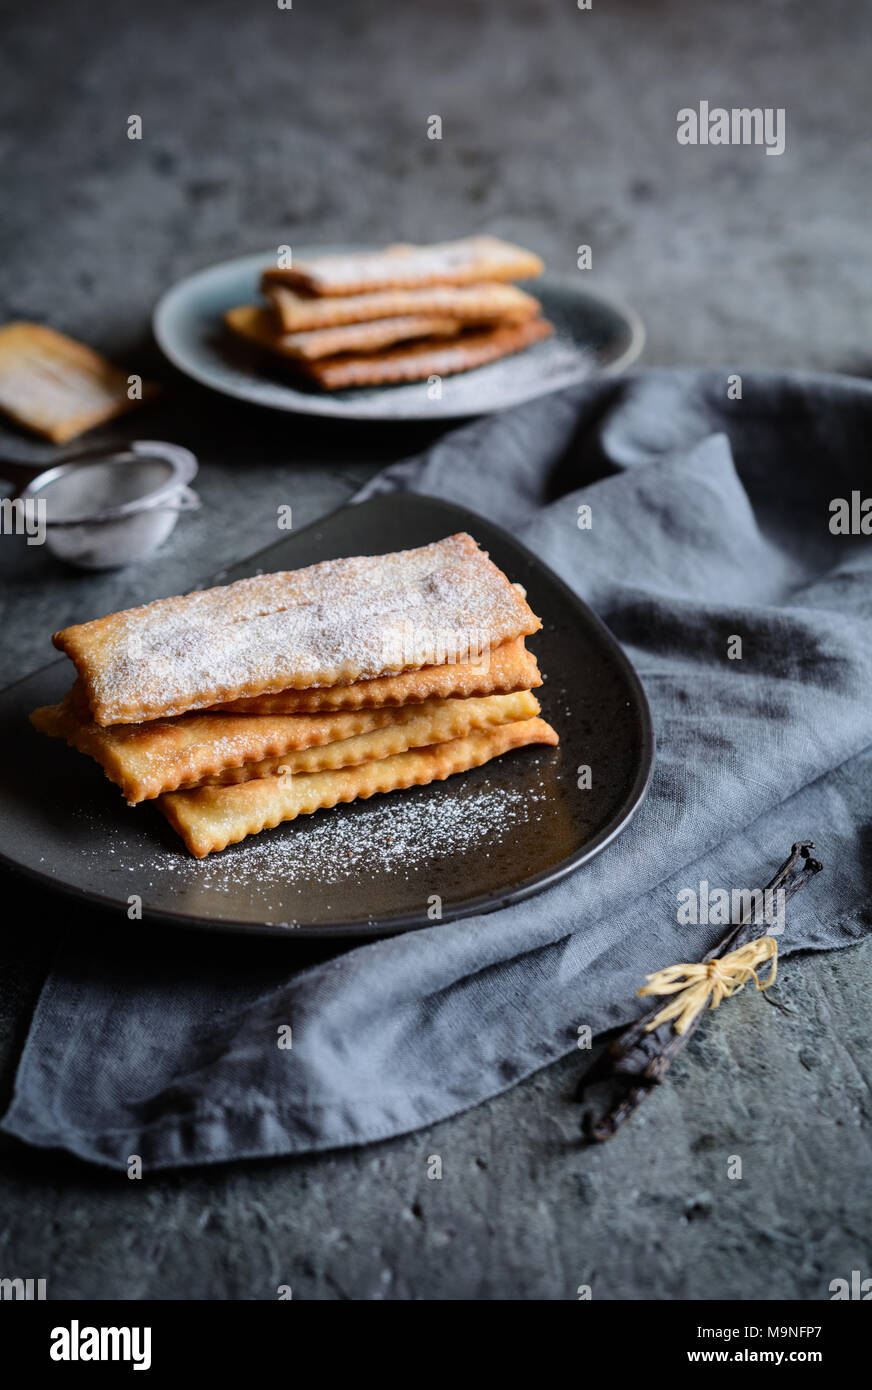 Chiacchiere - Carnaval italiano tradicional pastelería dulce Imagen De Stock